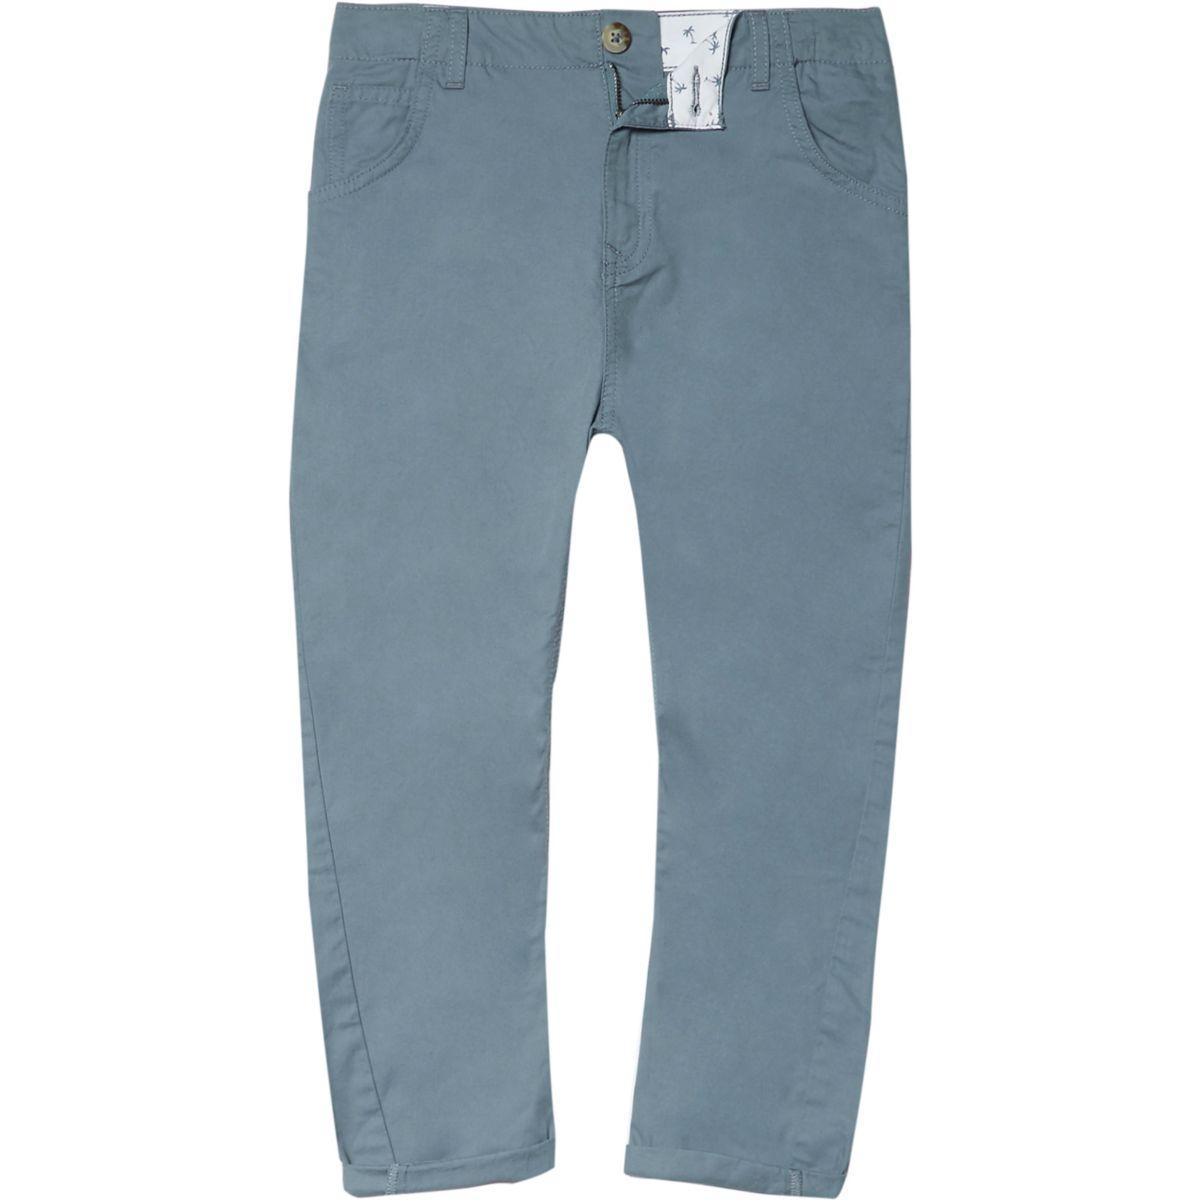 Pantalon chino fuselé bleu clair pour garçon